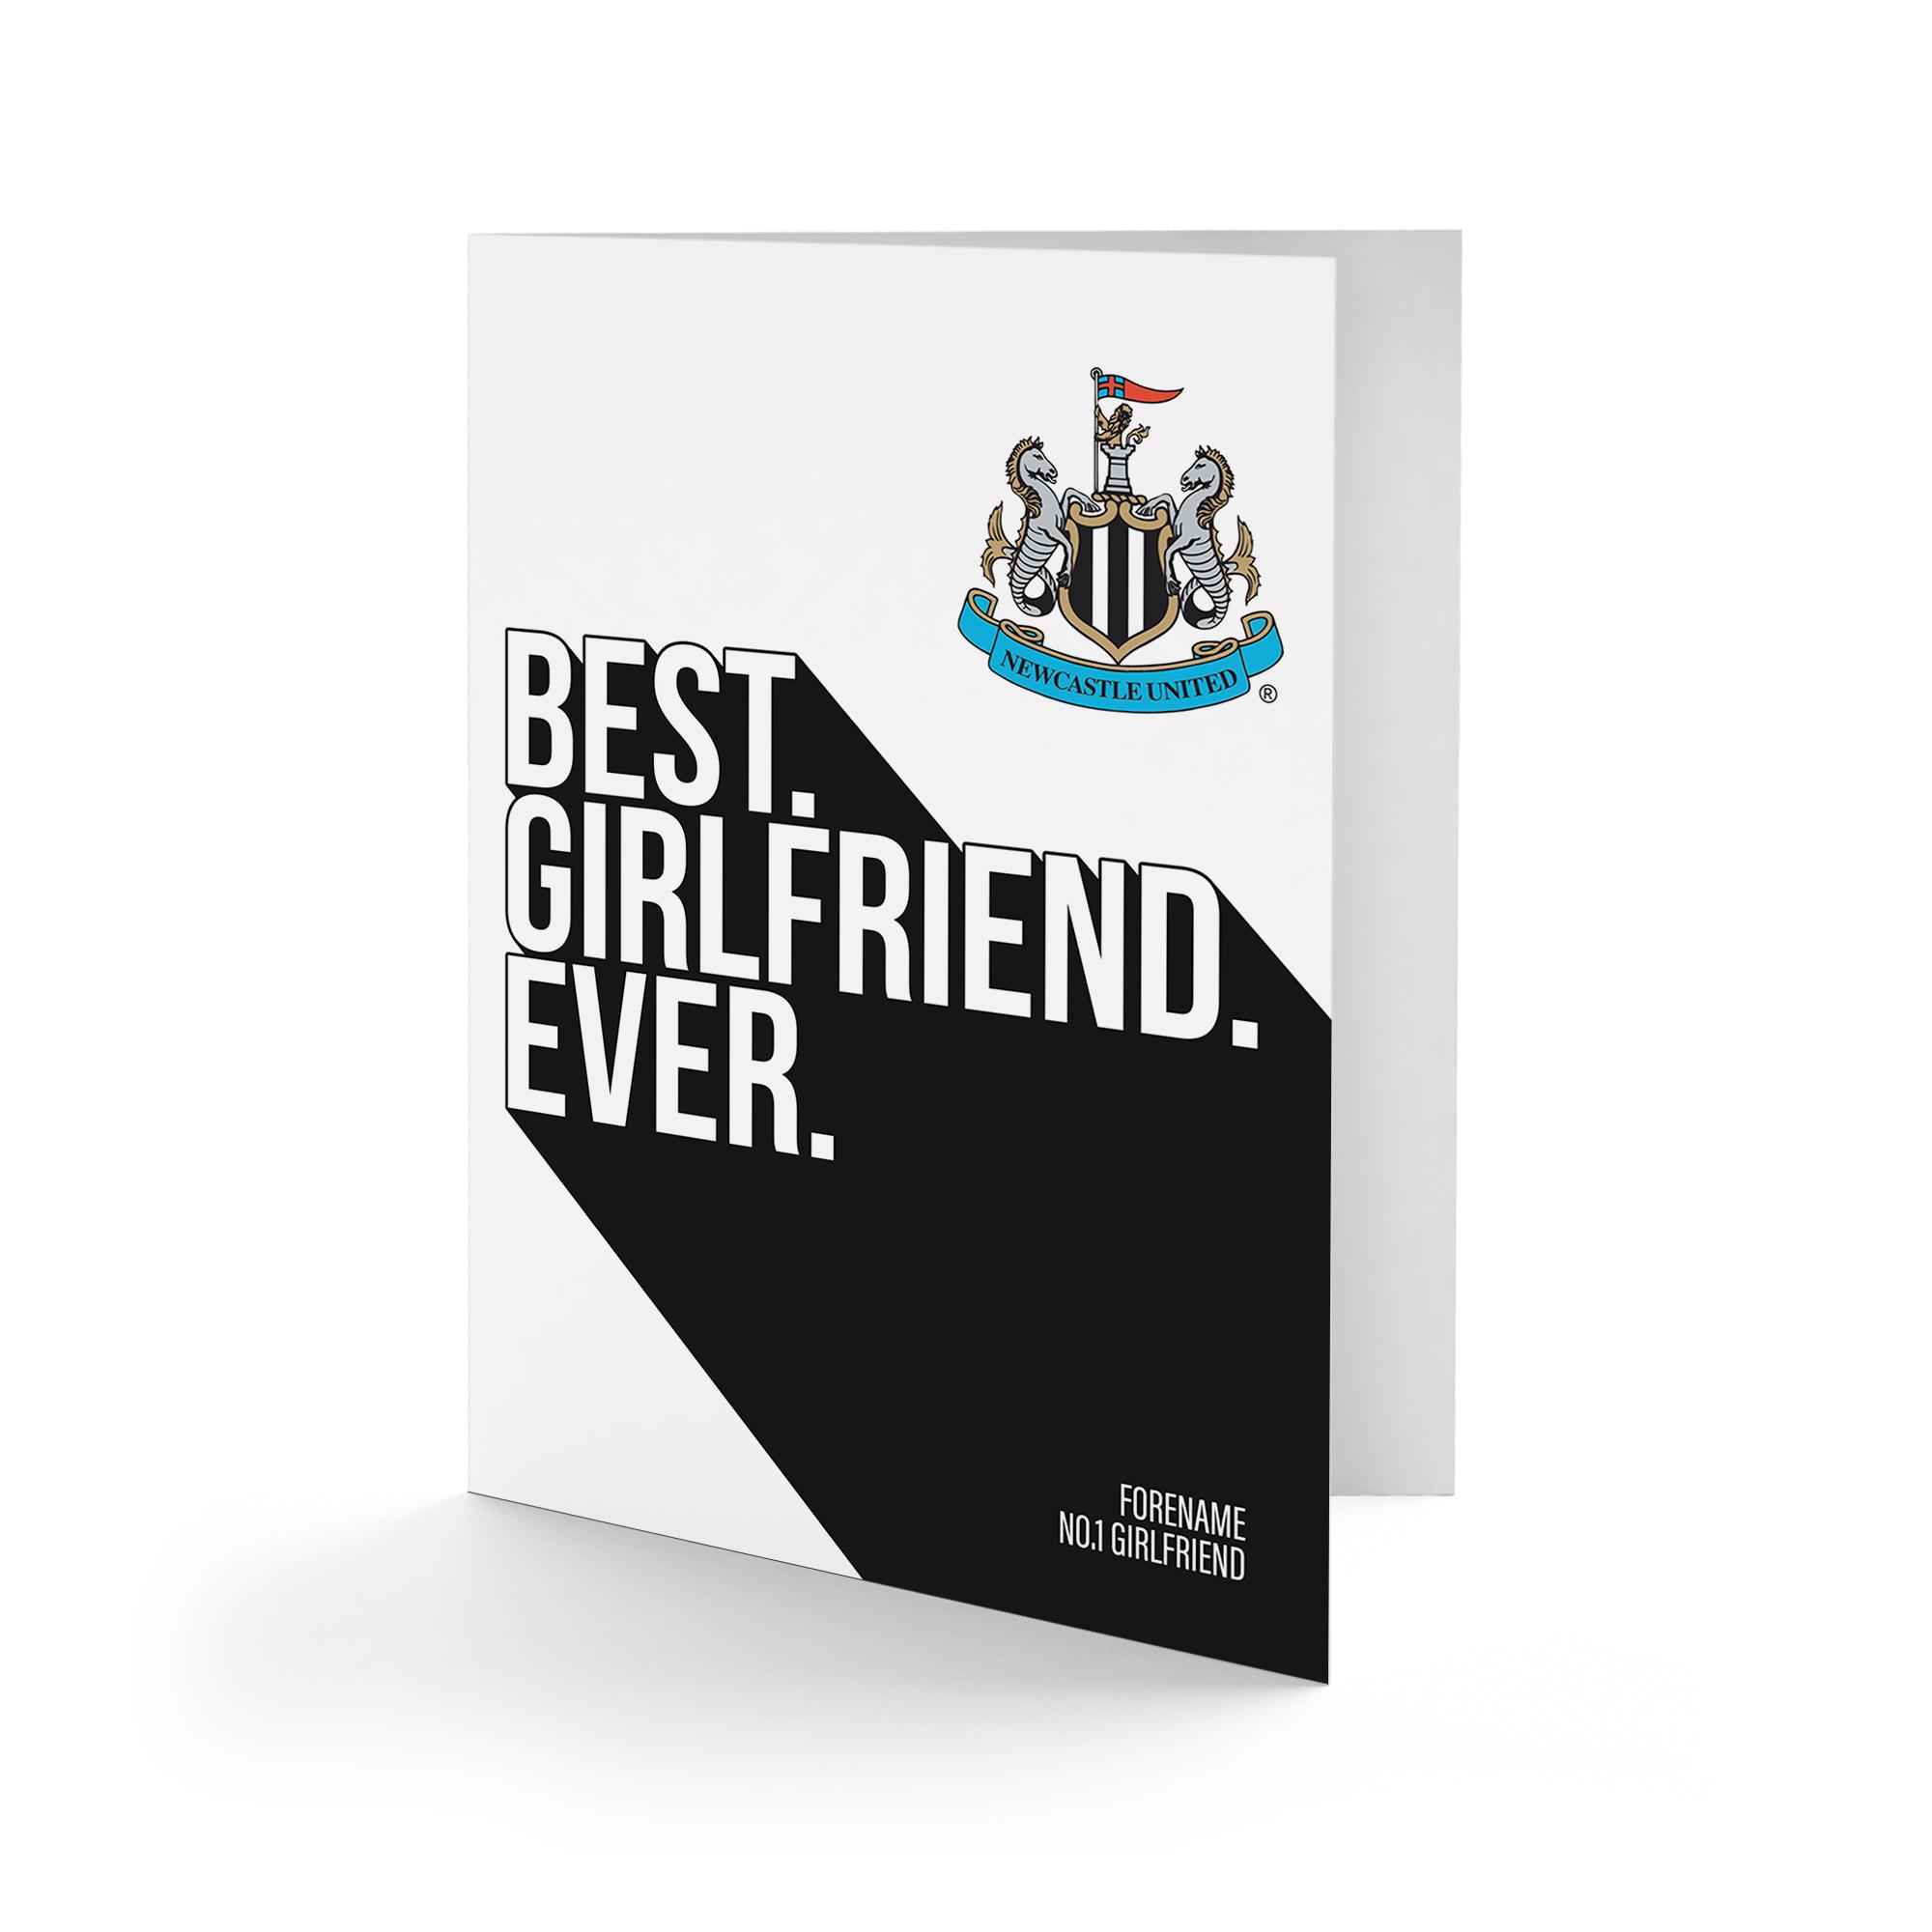 Newcastle United FC Best Girlfriend Ever Card